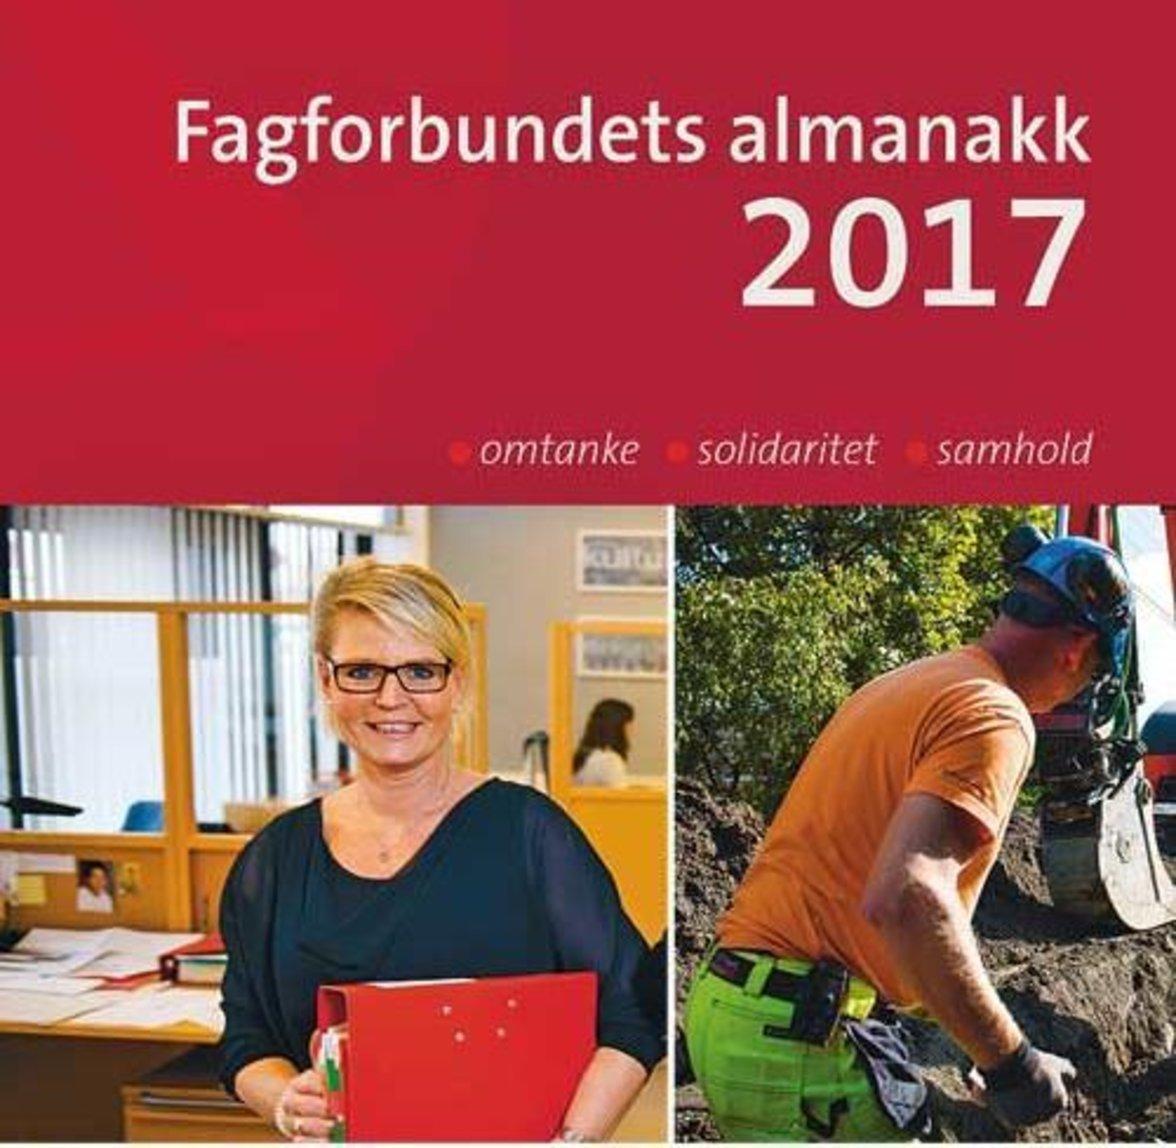 ff_almanakk_2017omslagbeskjært.jpg